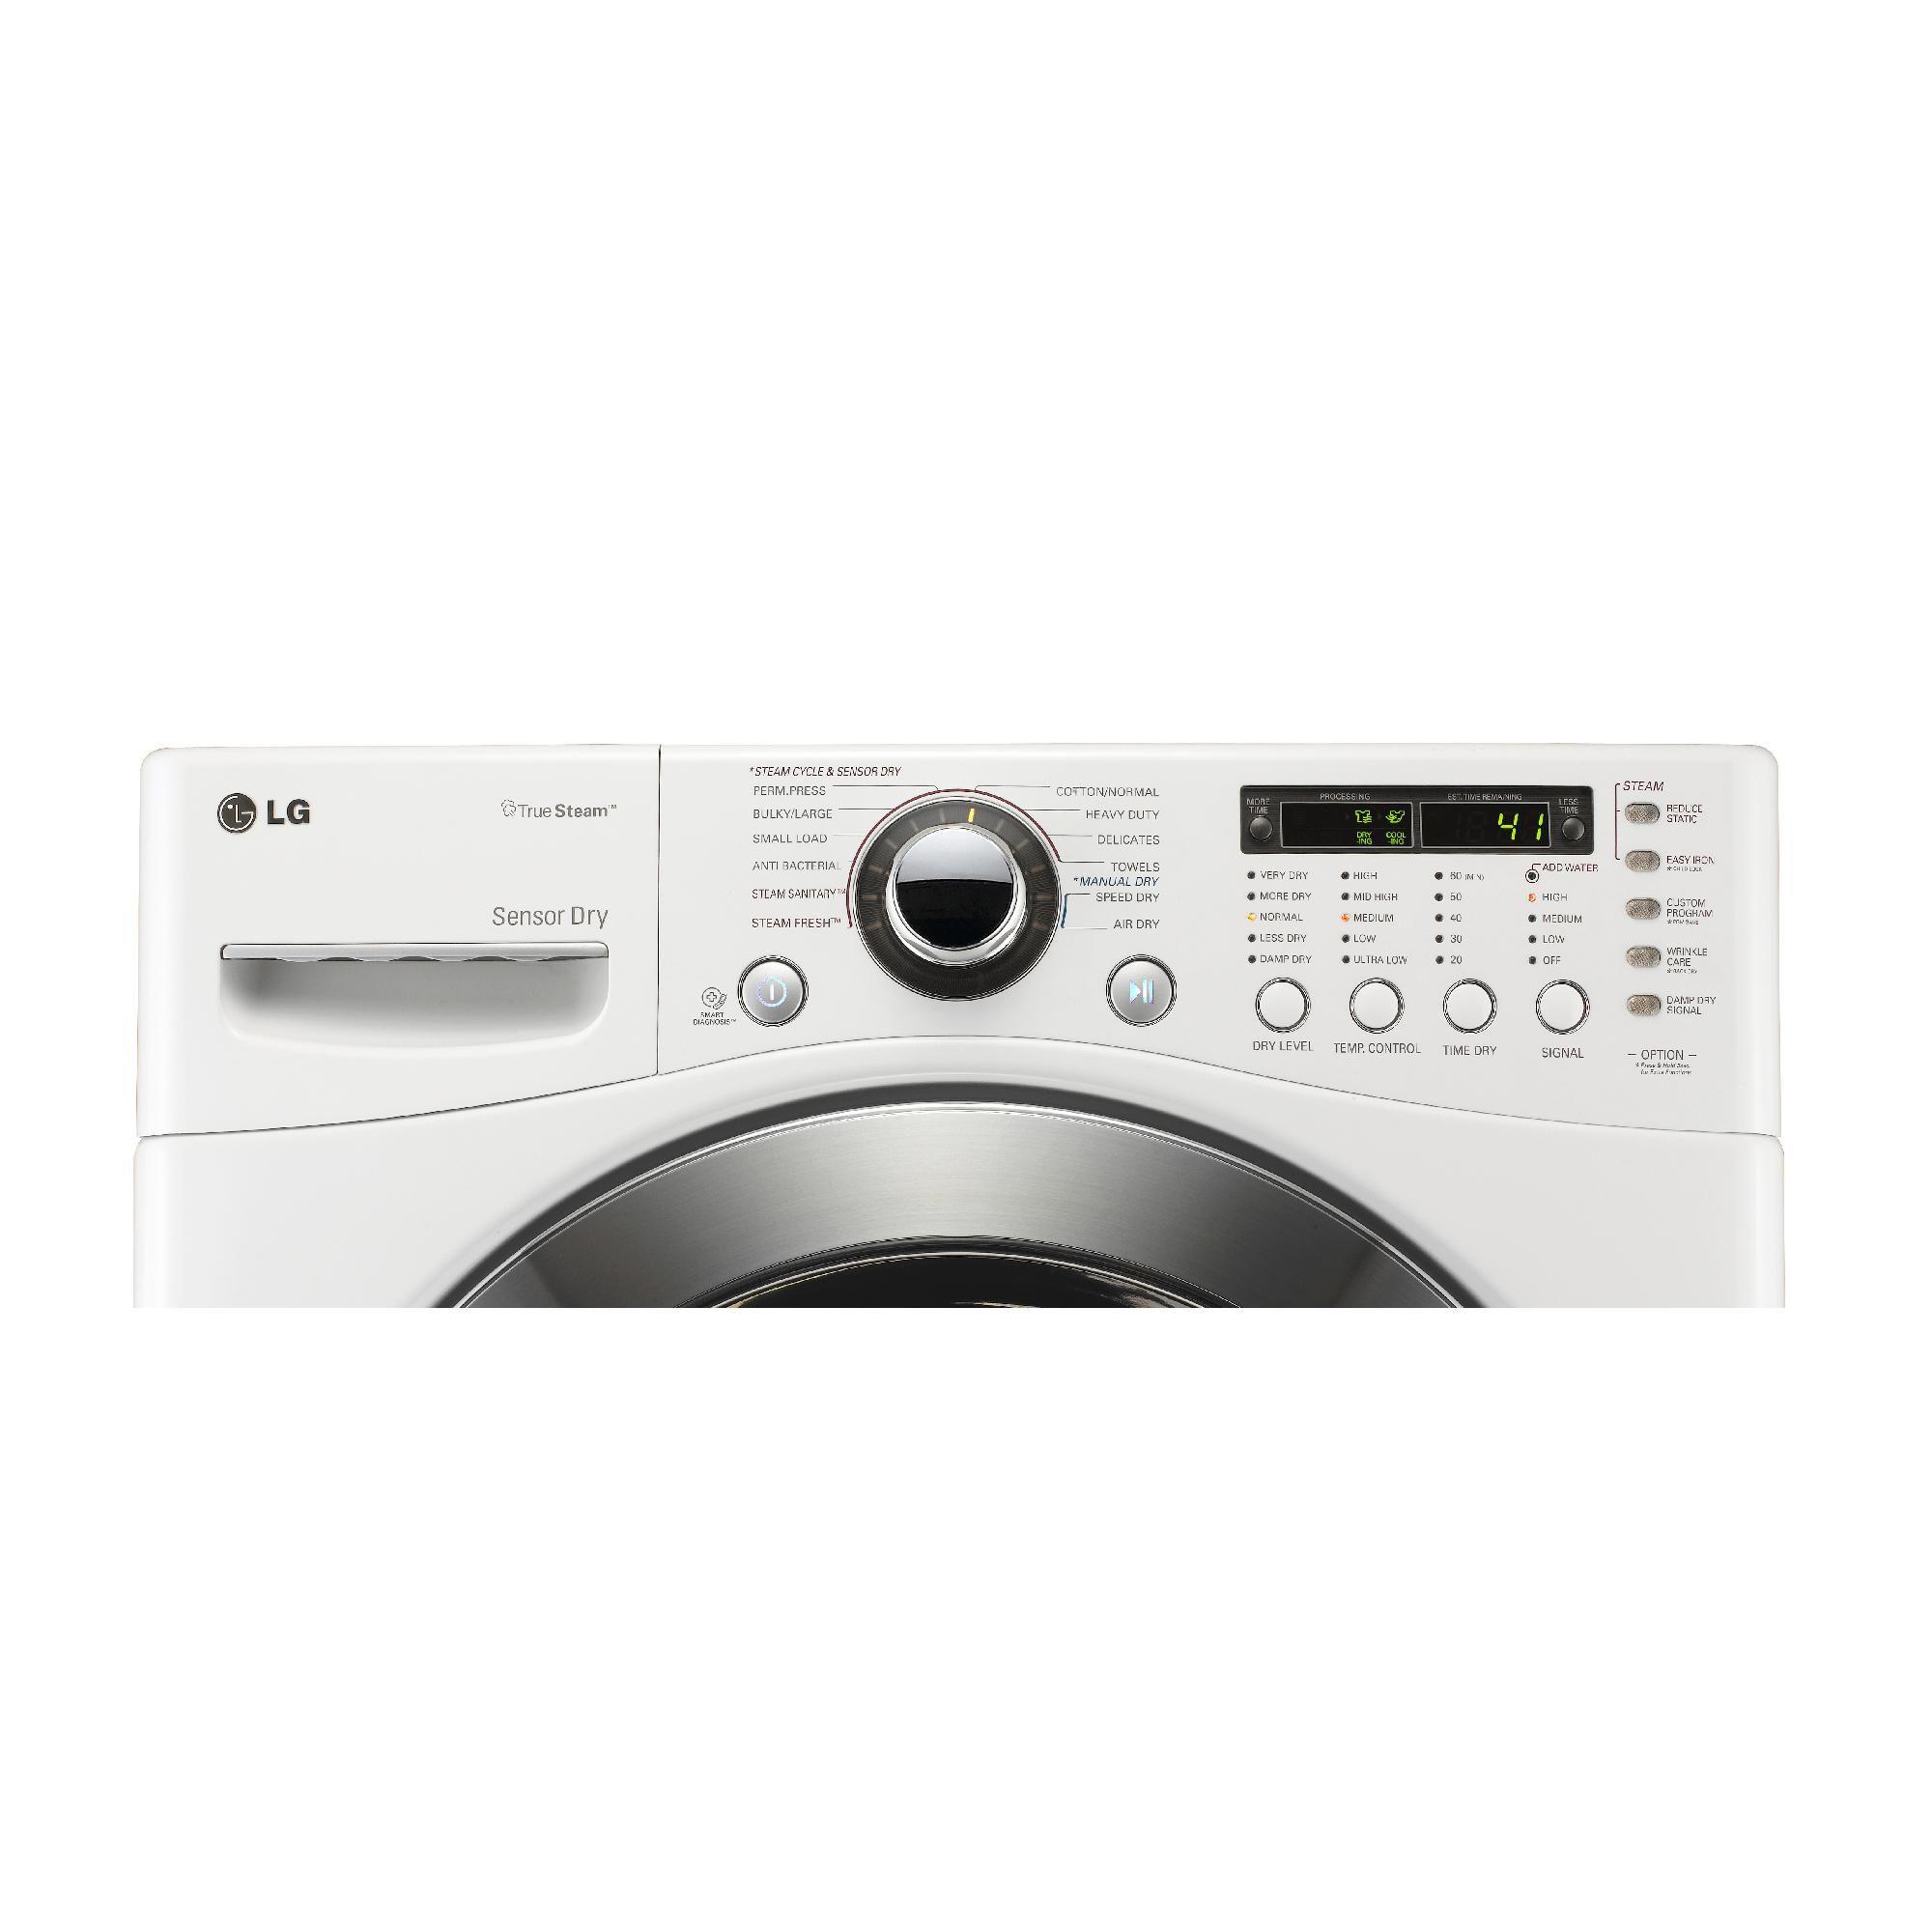 LG 7.4 cu. ft. Gas Dryer - White